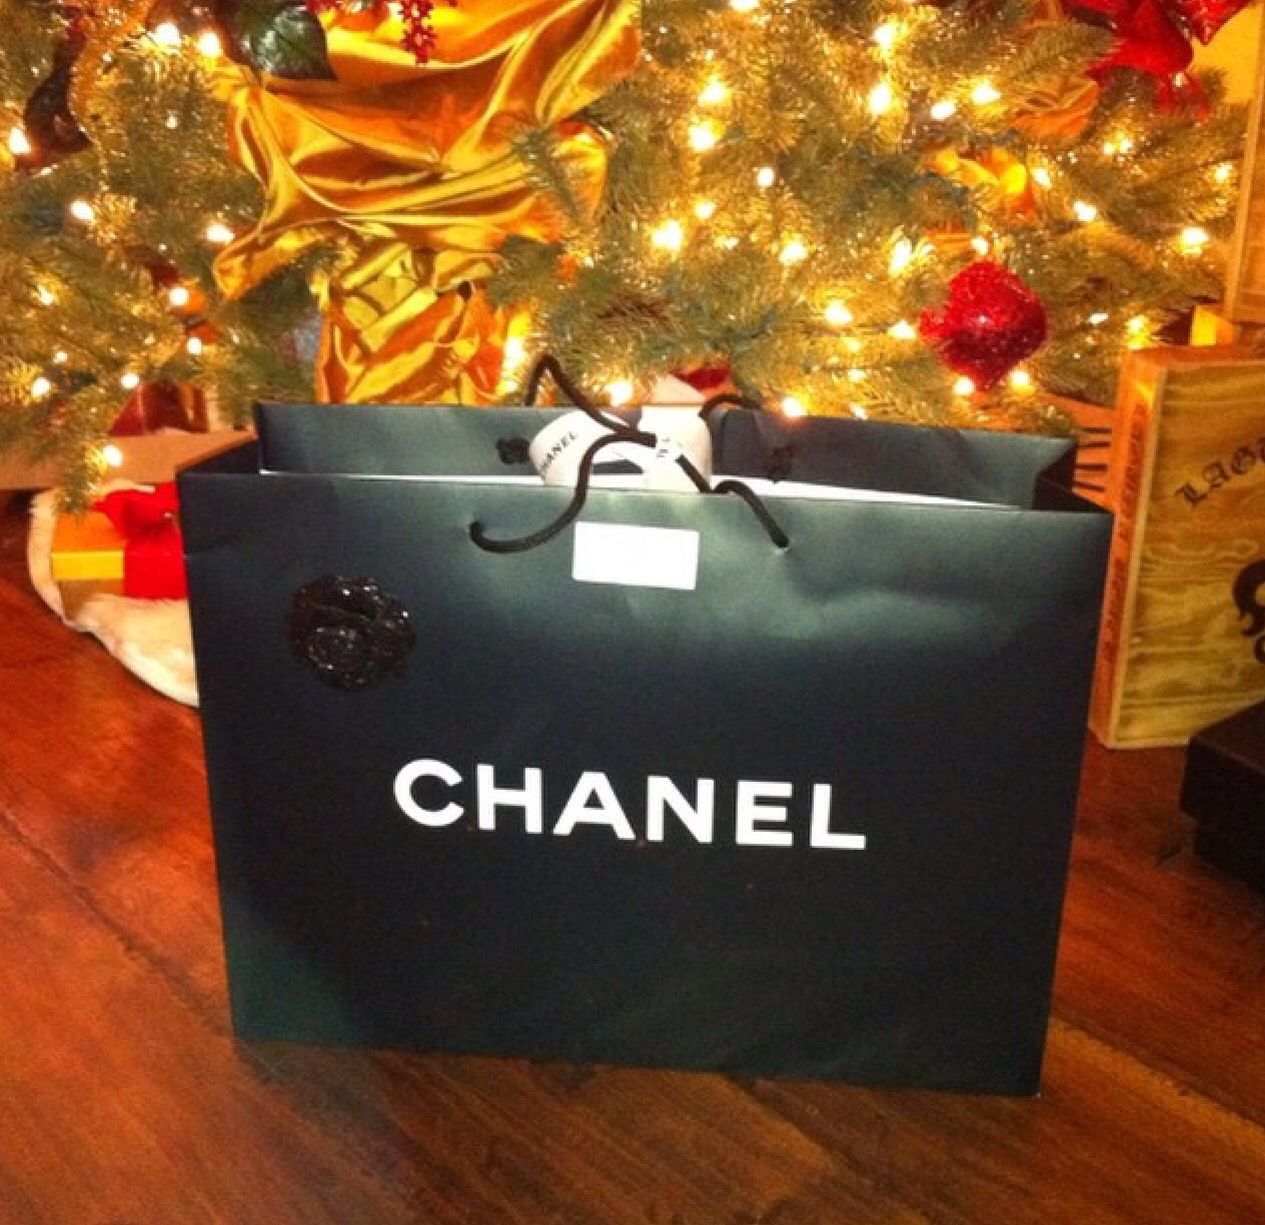 Every Christmas please